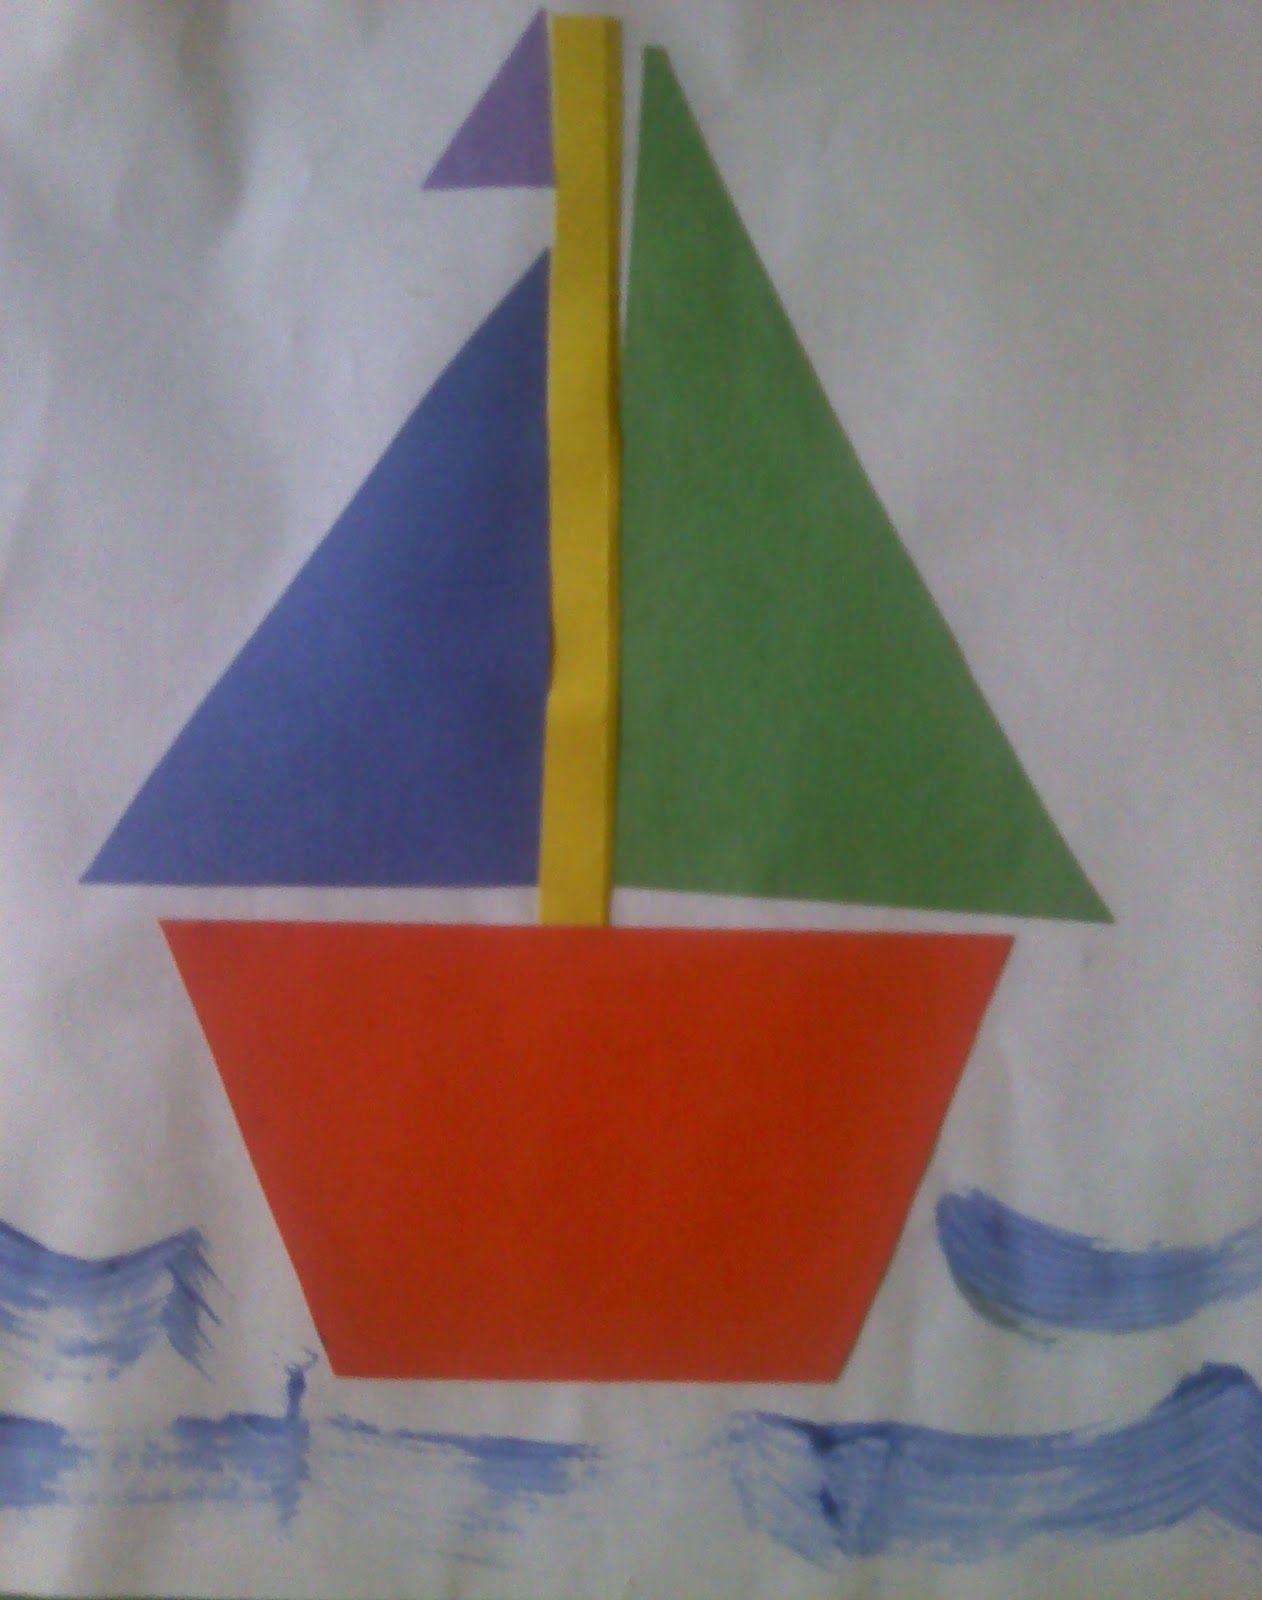 Crafts For Preschoolers Shape Sailboat